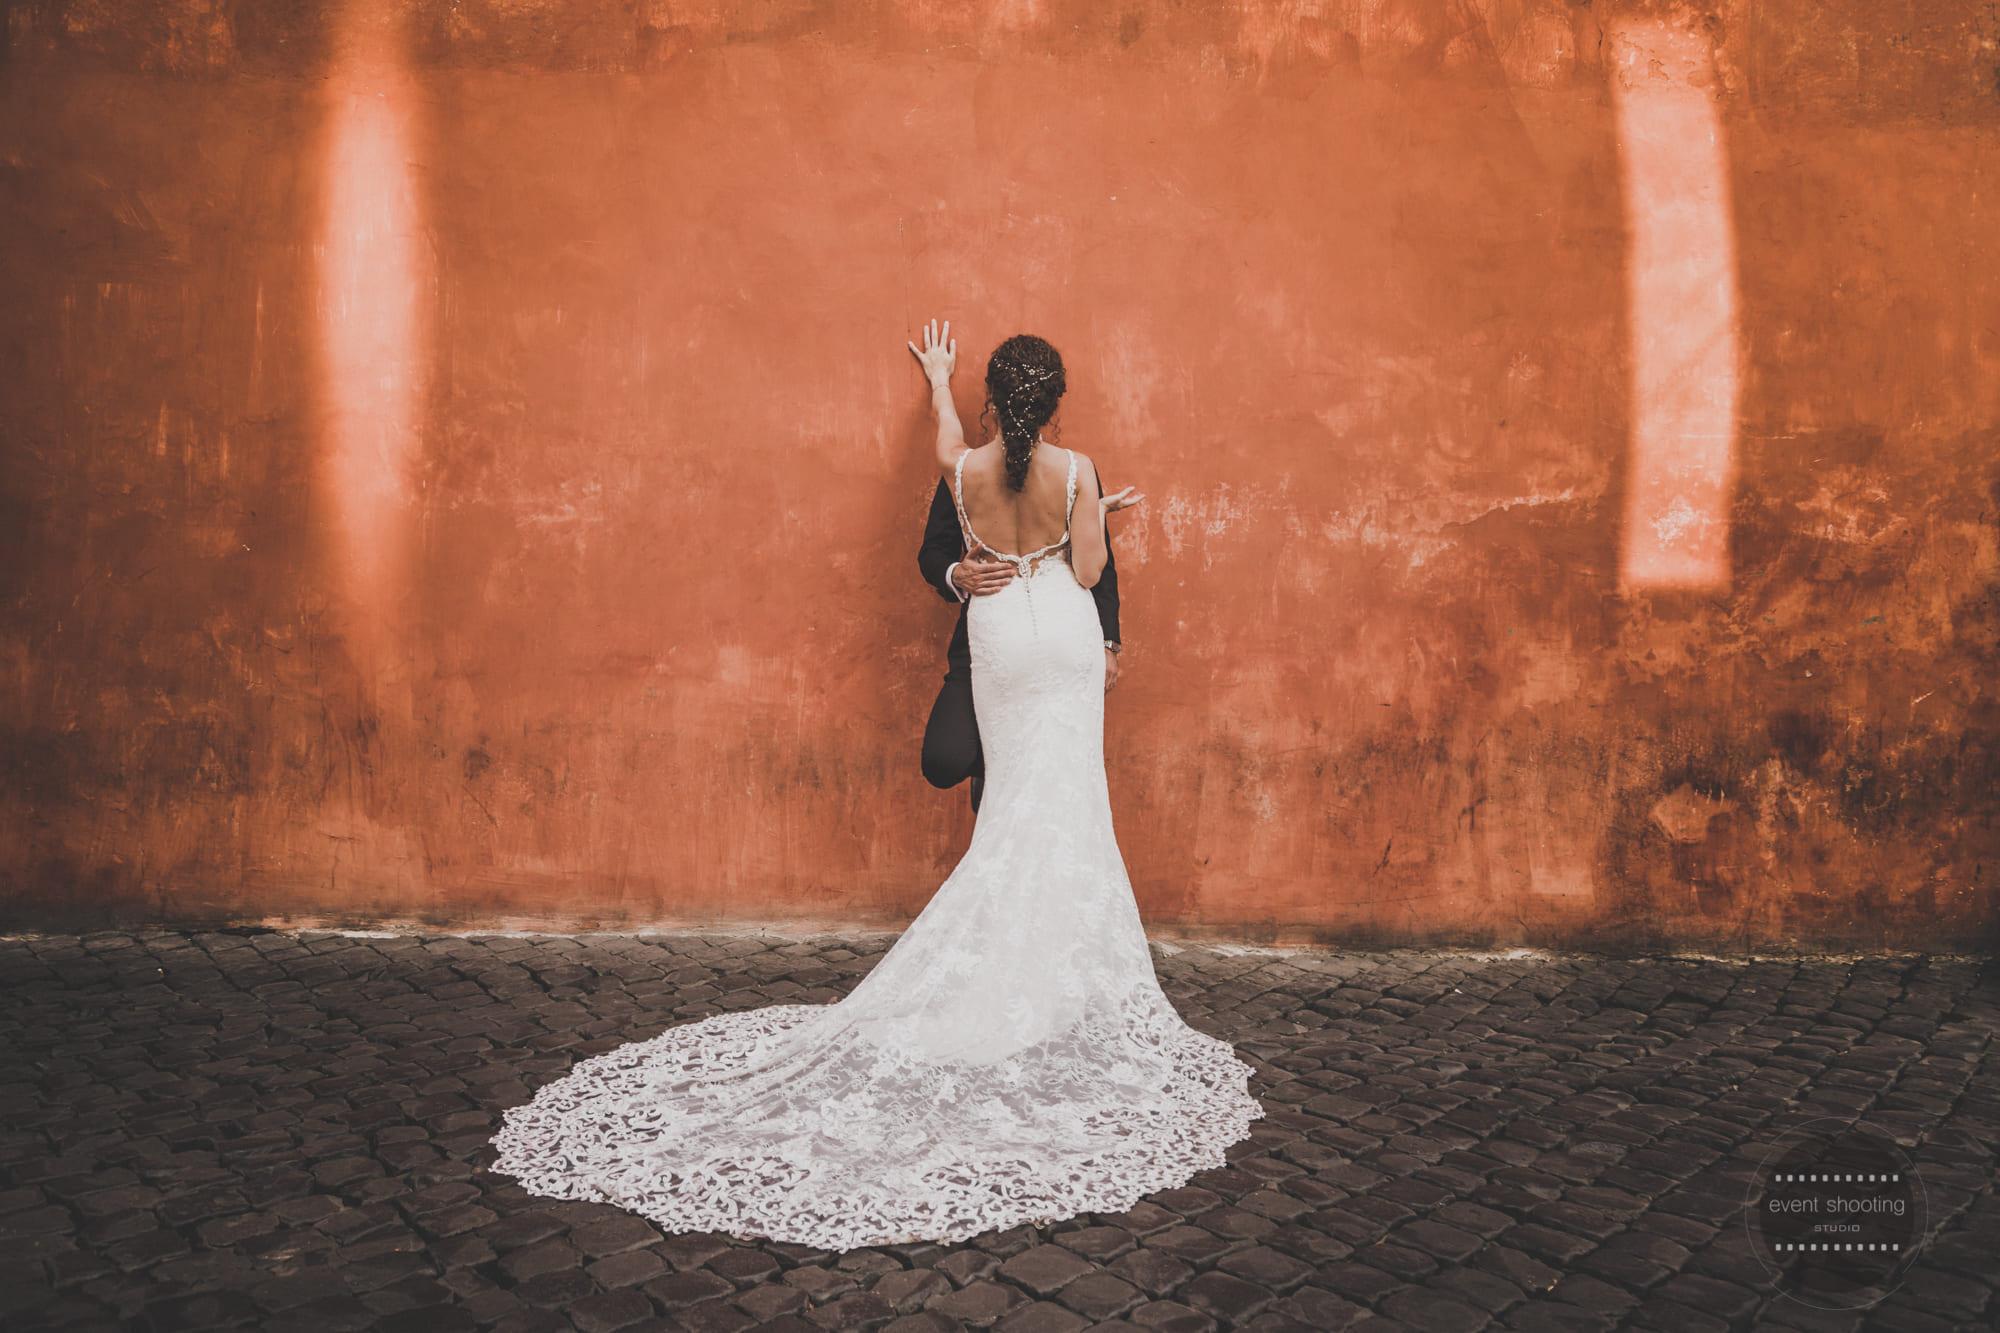 Trastevere Matrimonio Turco Casina Valadier Event Shooting